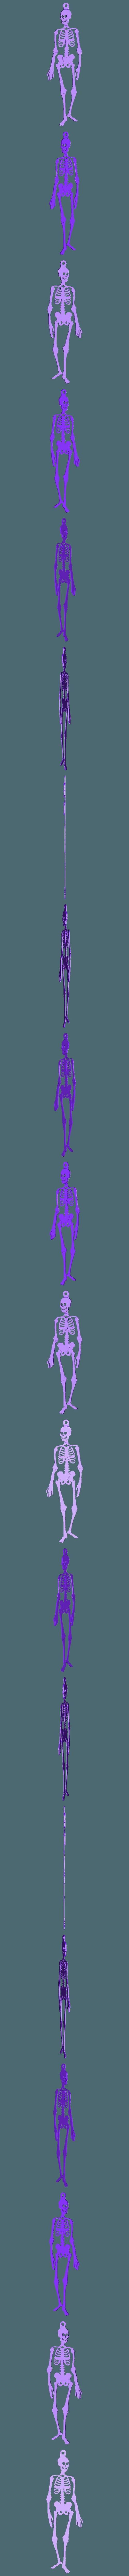 skeleton_bunting.stl Download free STL file Skeleton Buntings • 3D printer template, 3DME